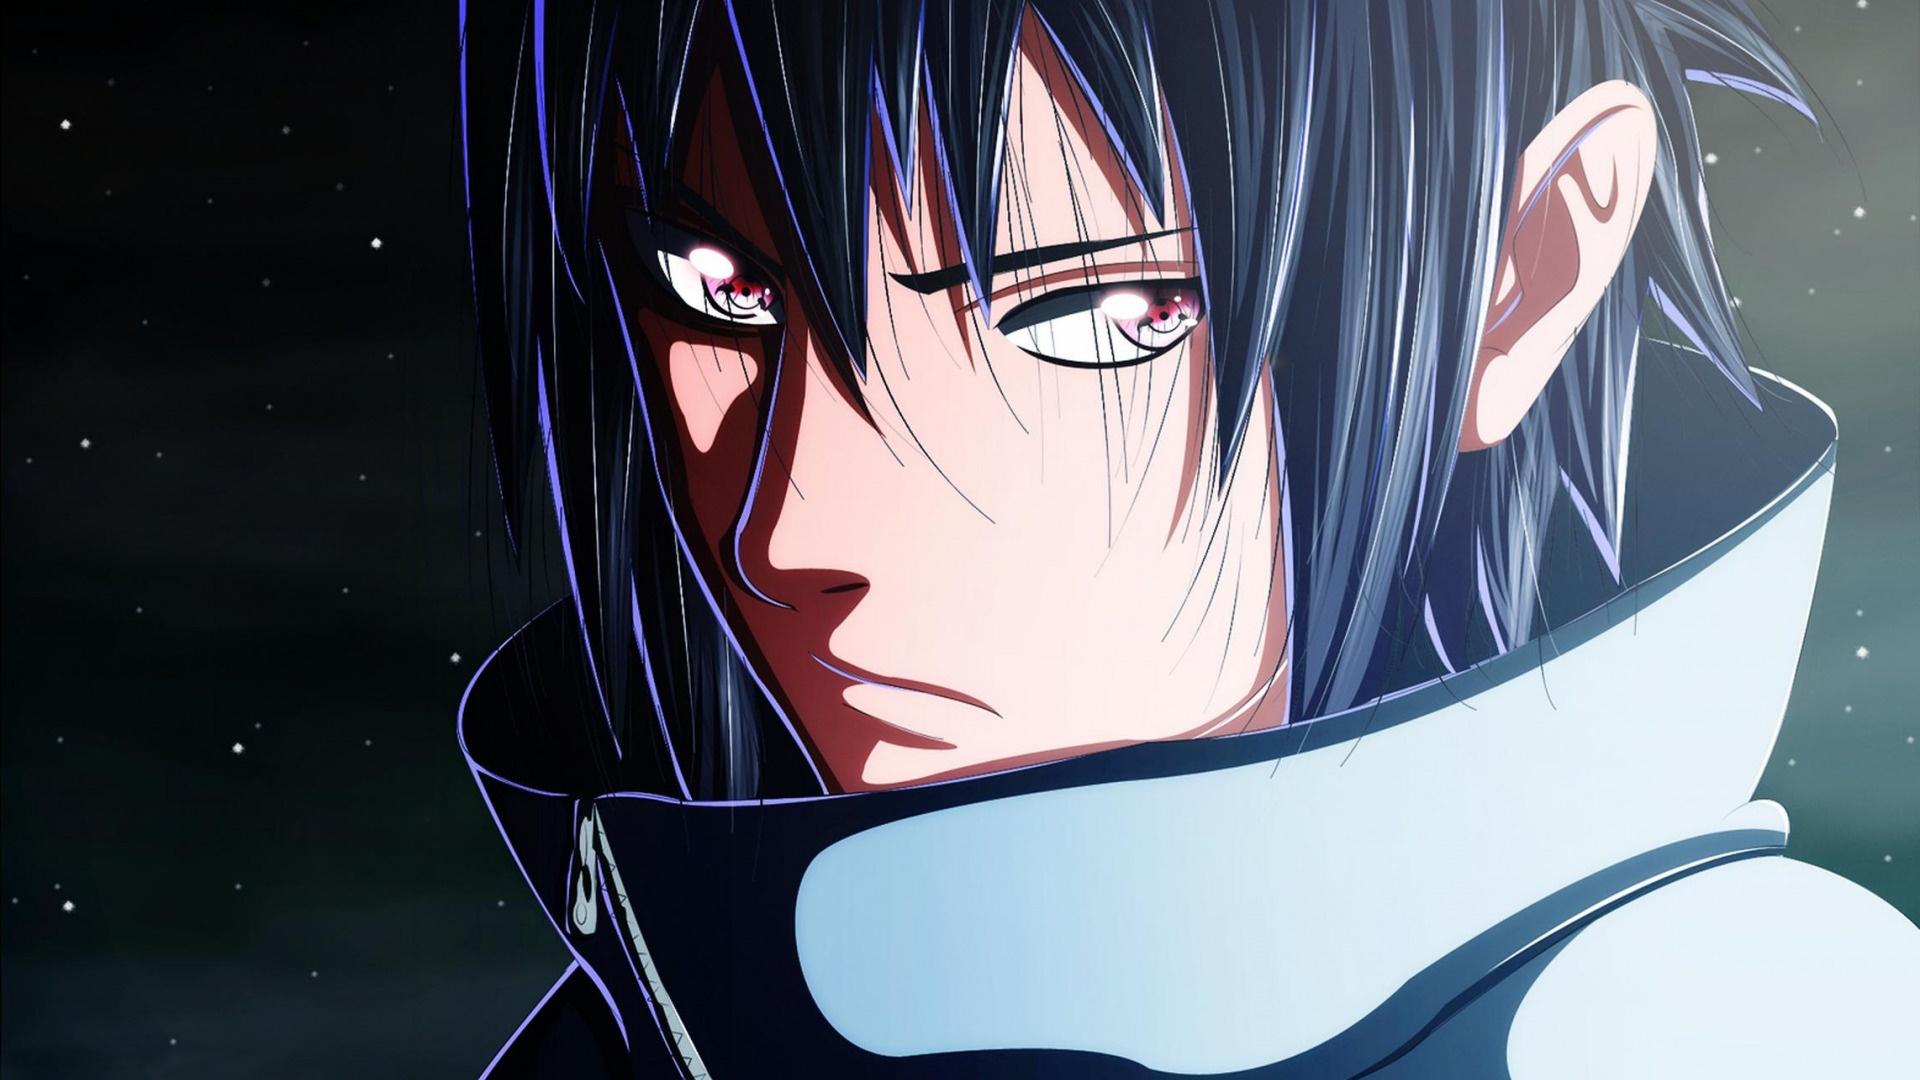 Sasuke free picture